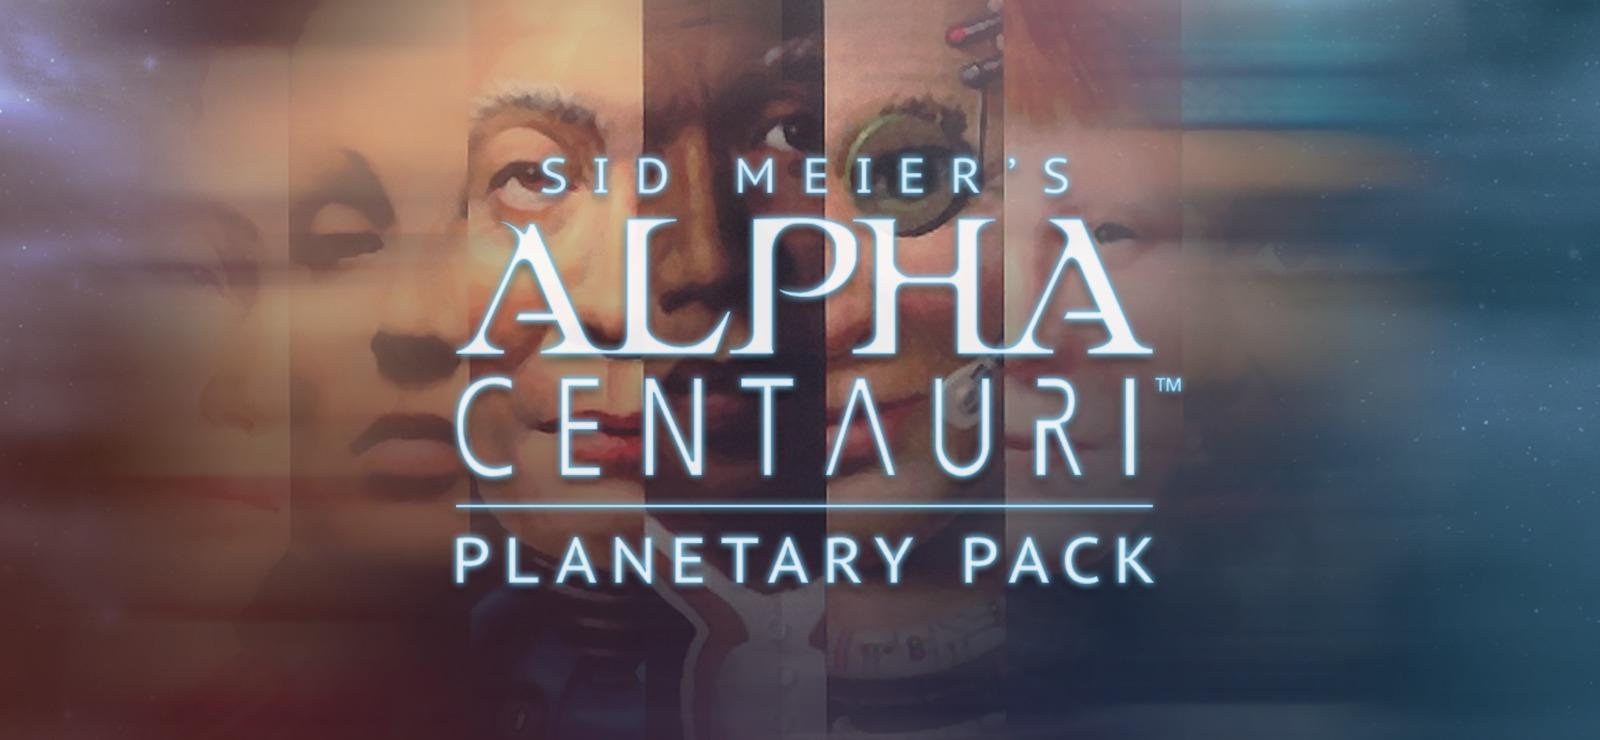 [ gog] Sid Meier's Alpha Centauri™ Planetary Pack für 1.39€ @ gog.com